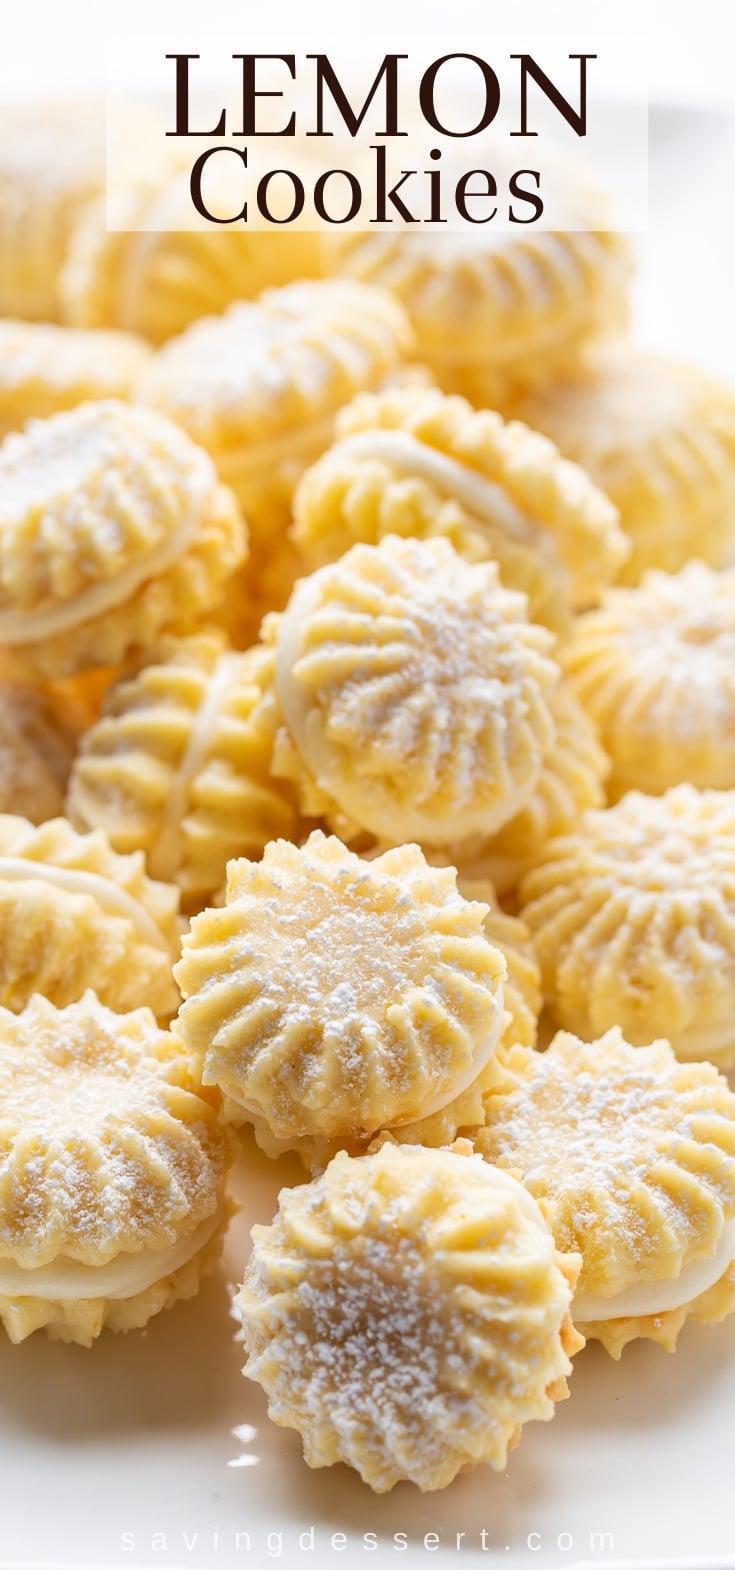 A platter of lemon cream filled cookies